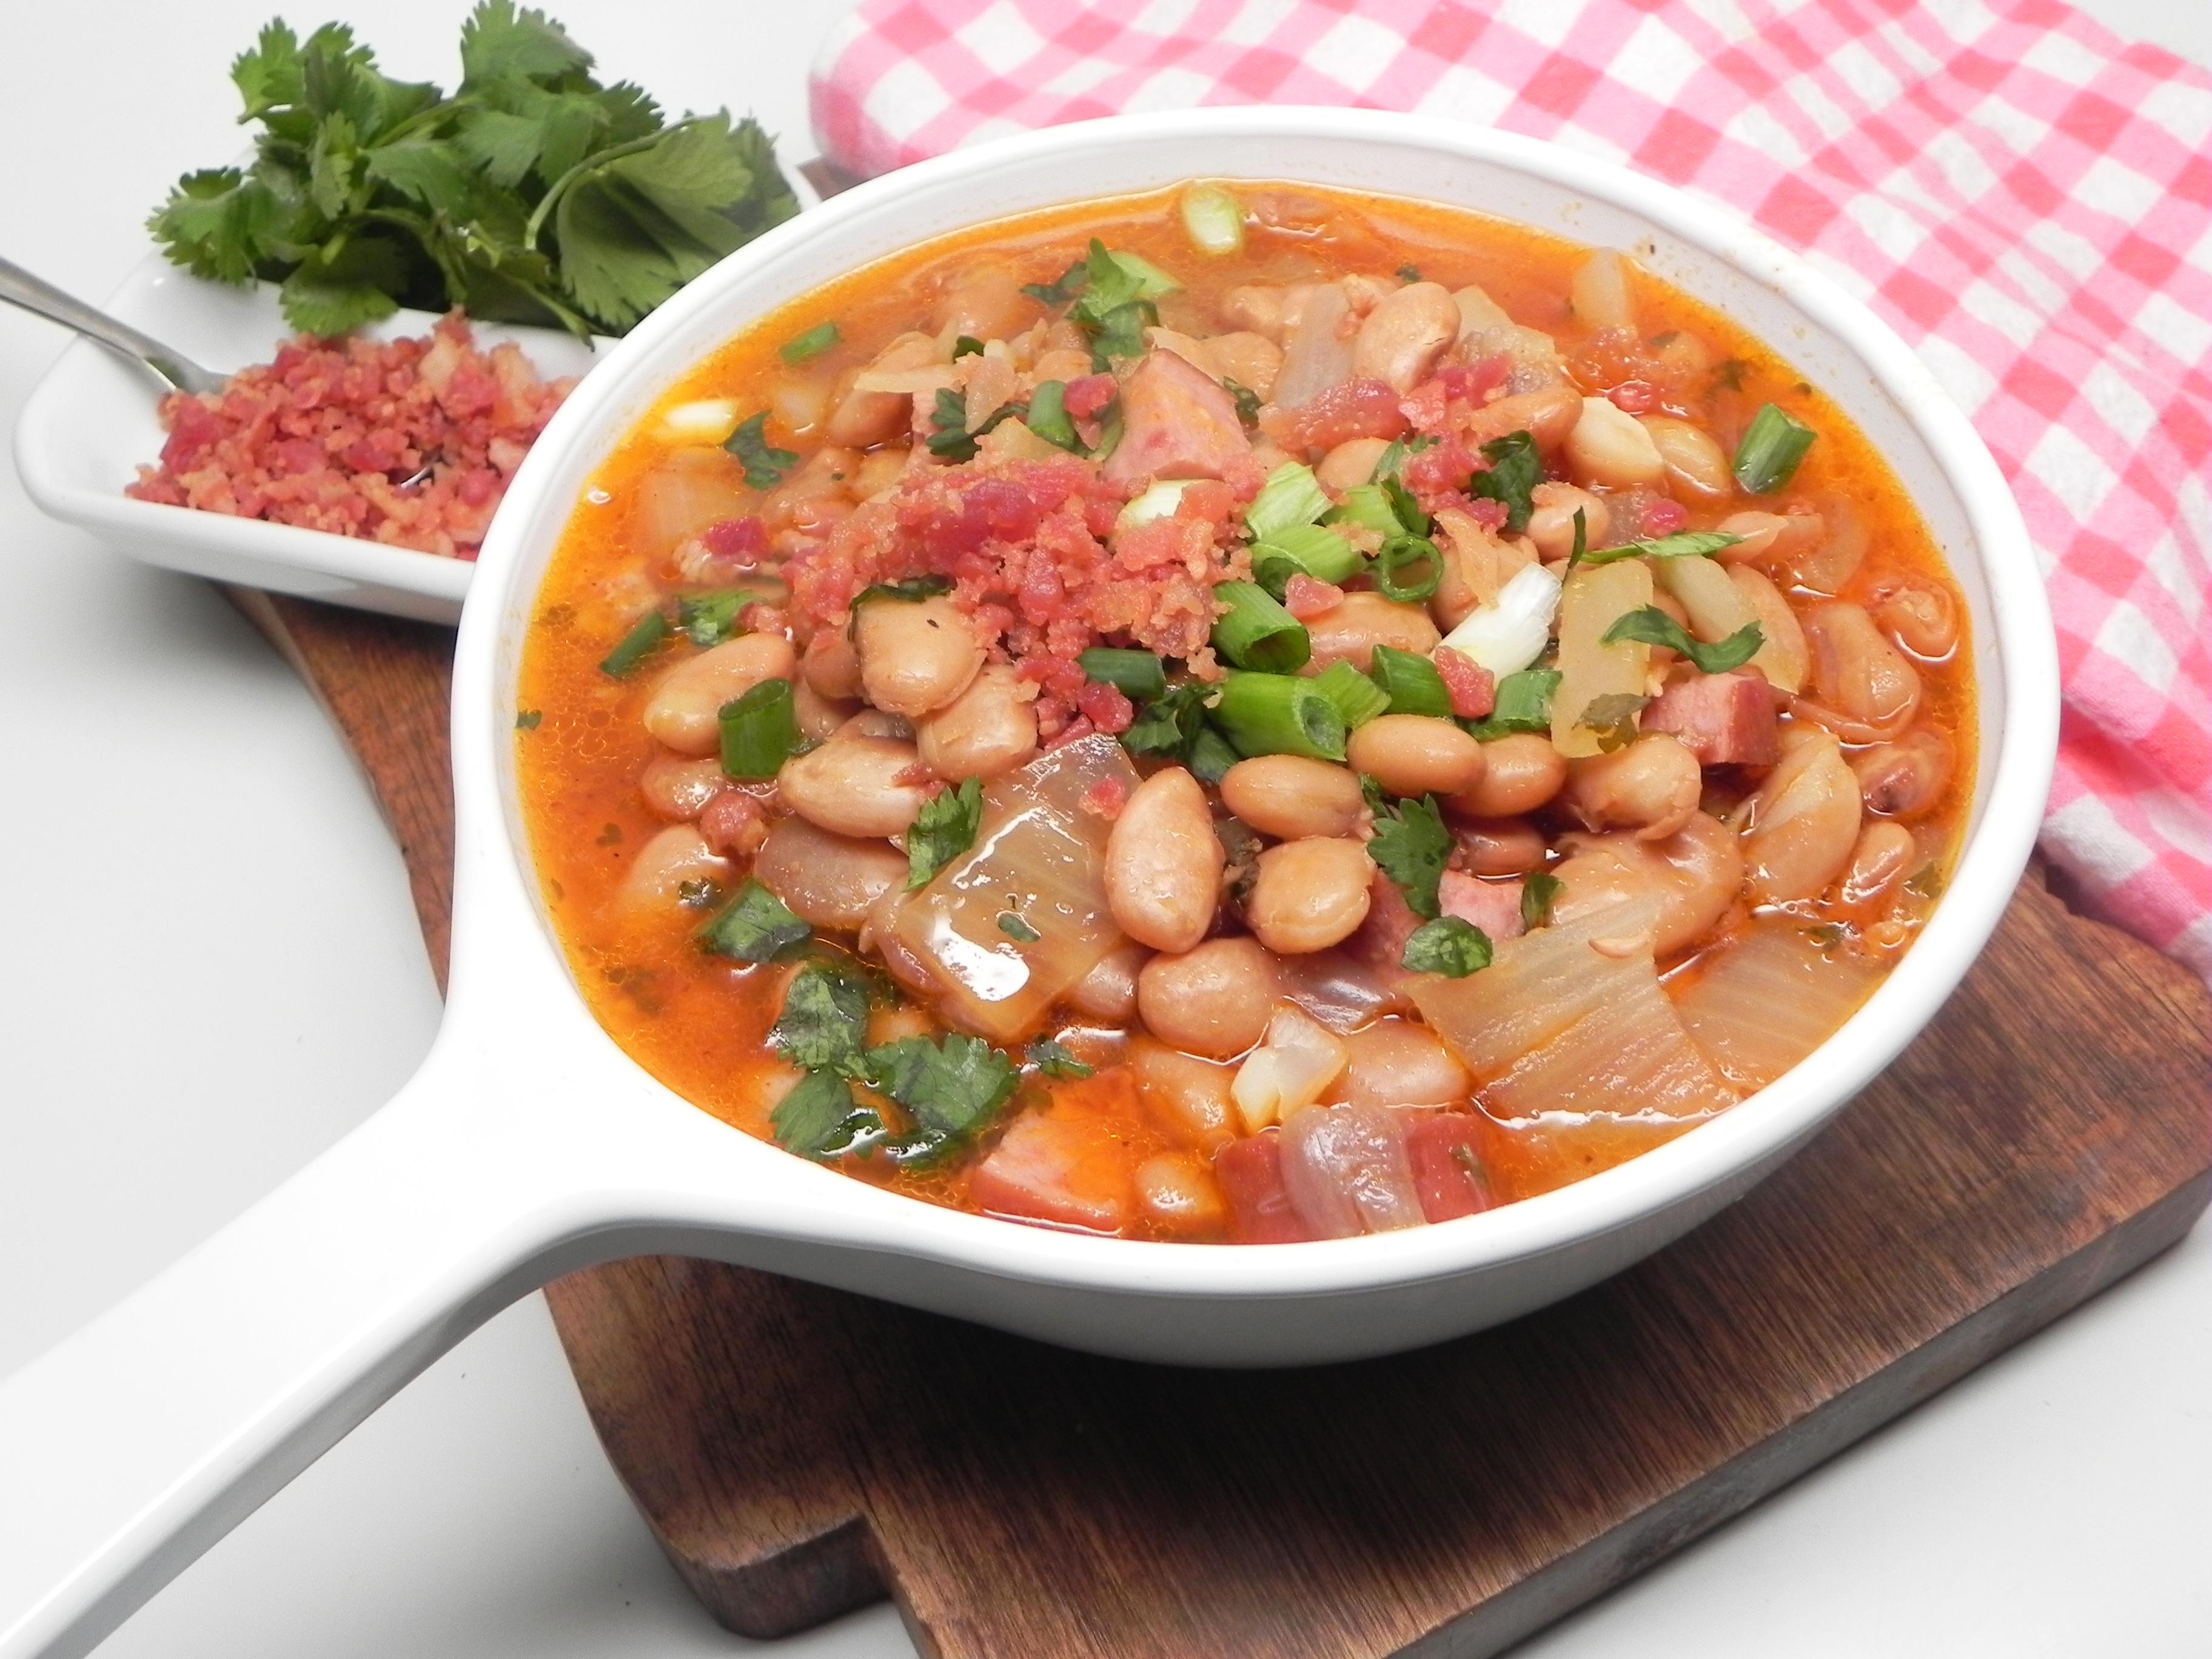 Instant Pot(R) Alcatra Feijao (Portuguese Bean Stew)